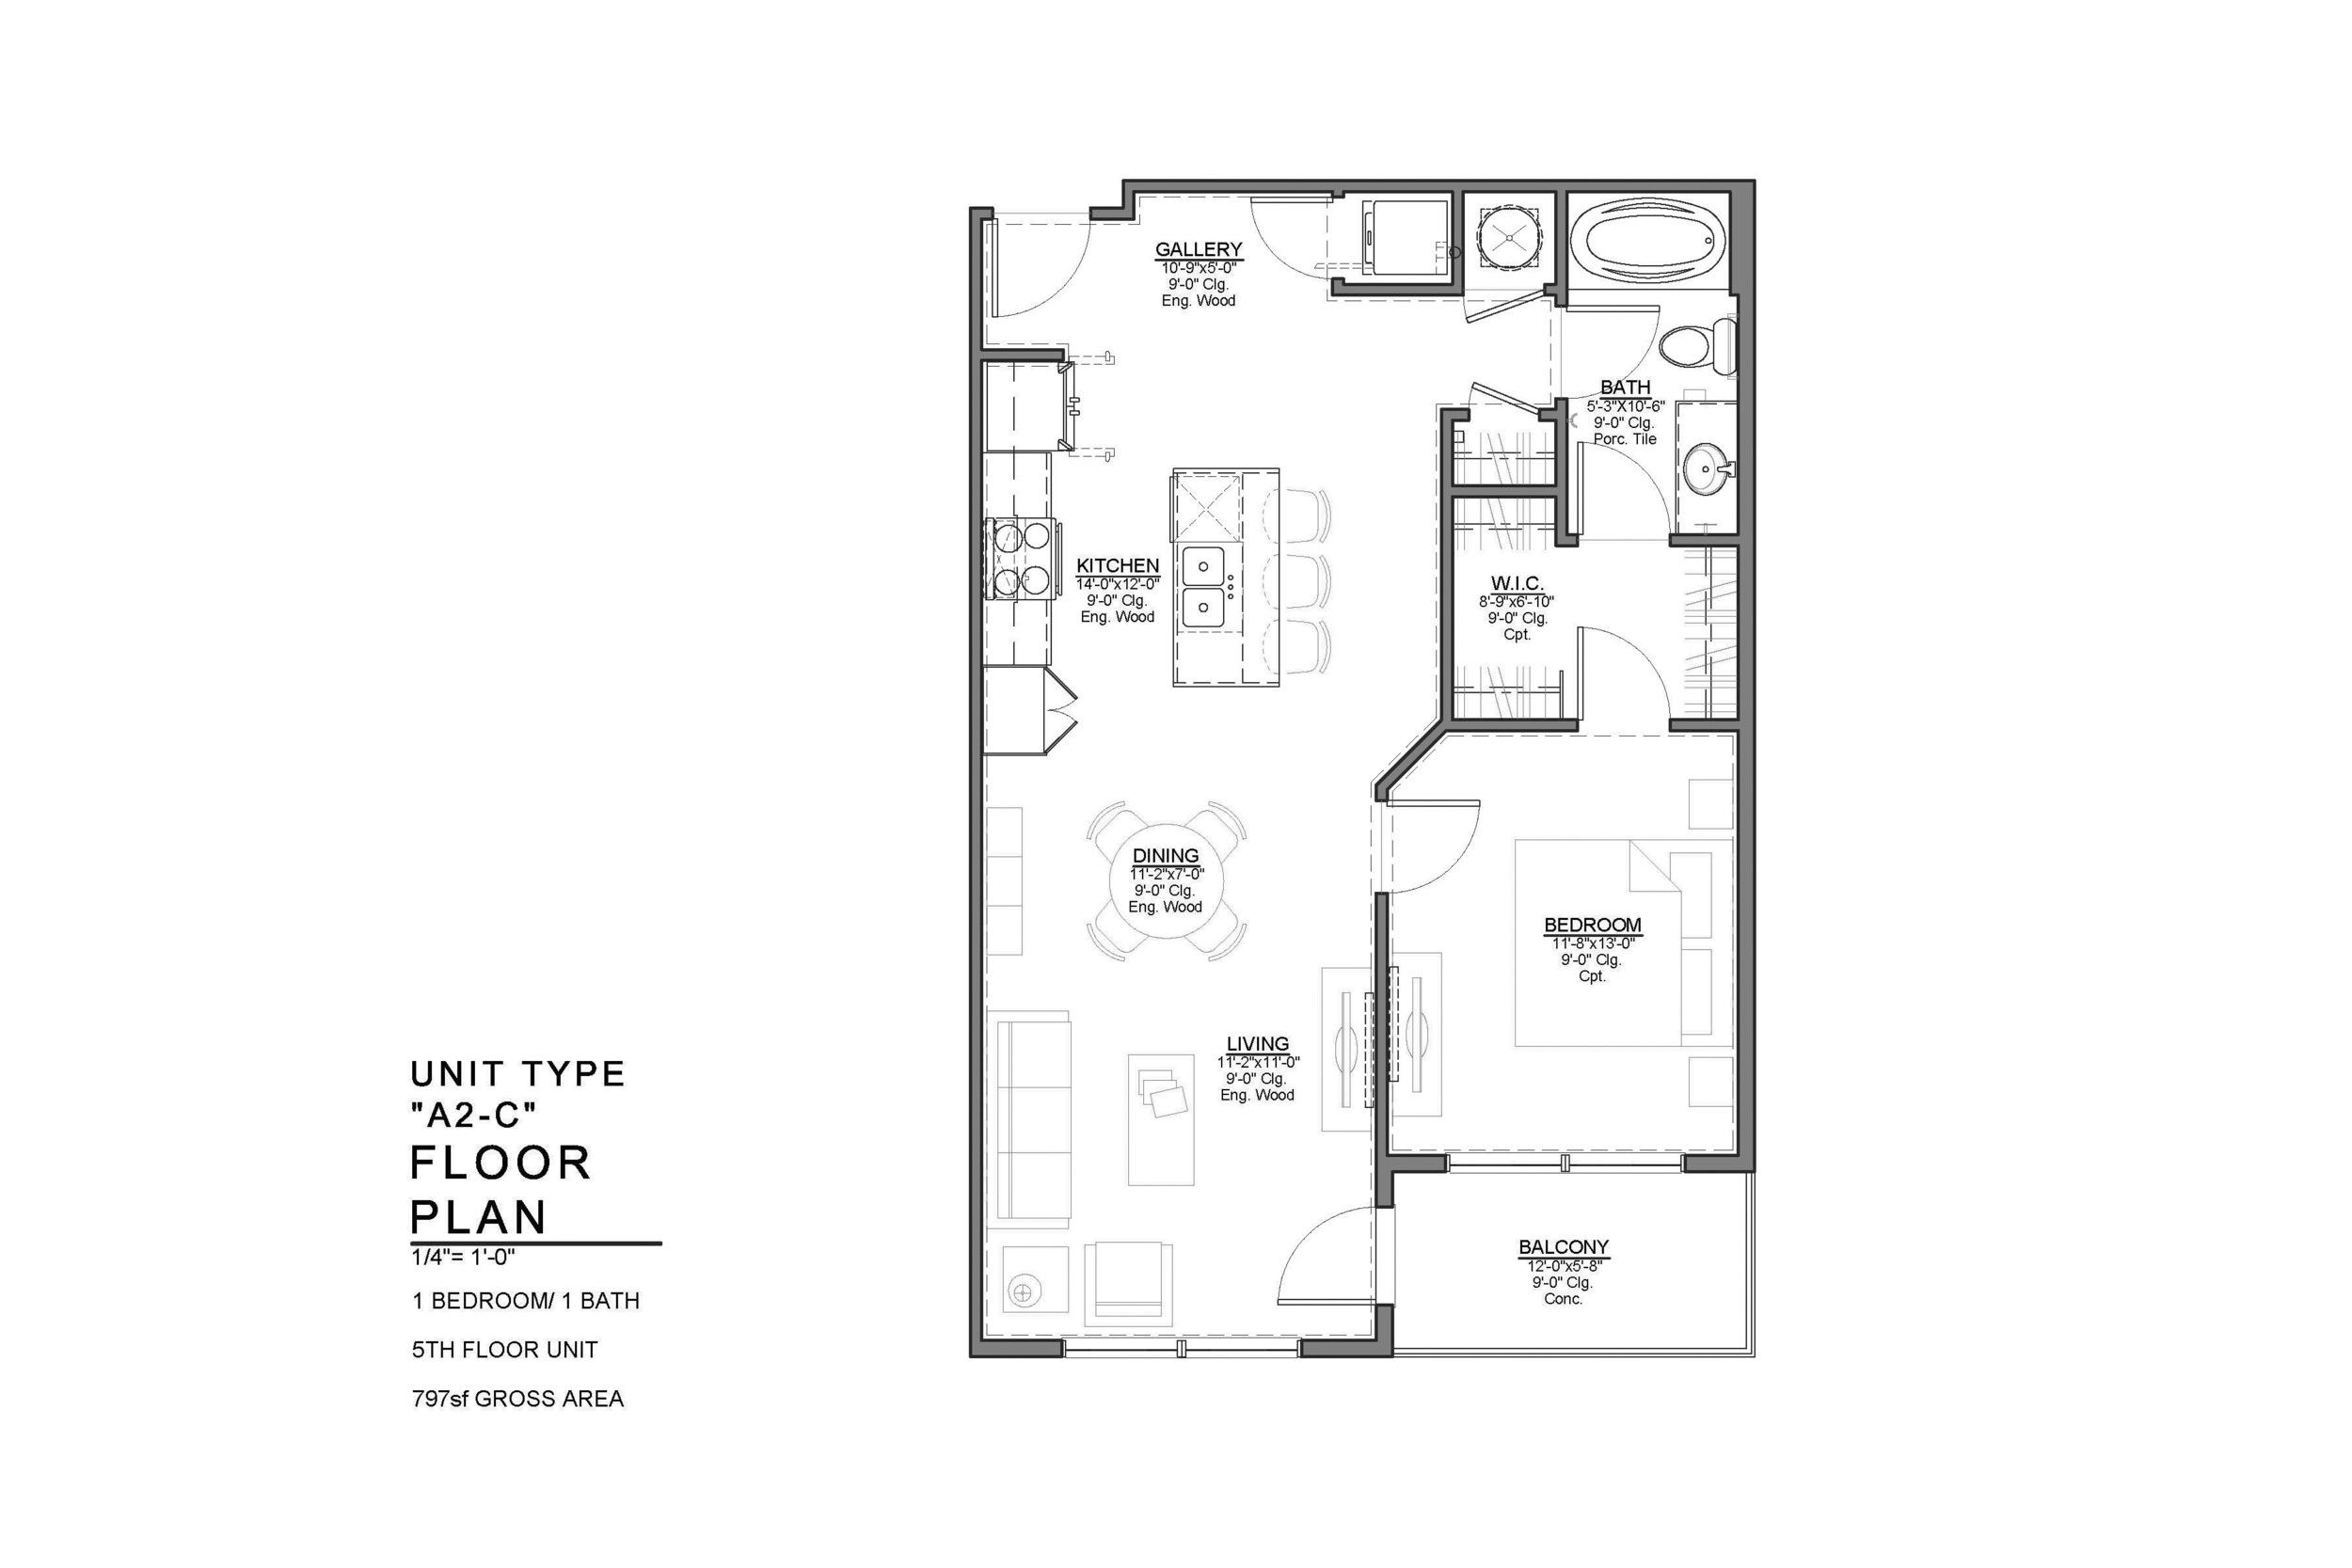 A2-C FLOOR PLAN: 1 BEDROOM / 1 BATH